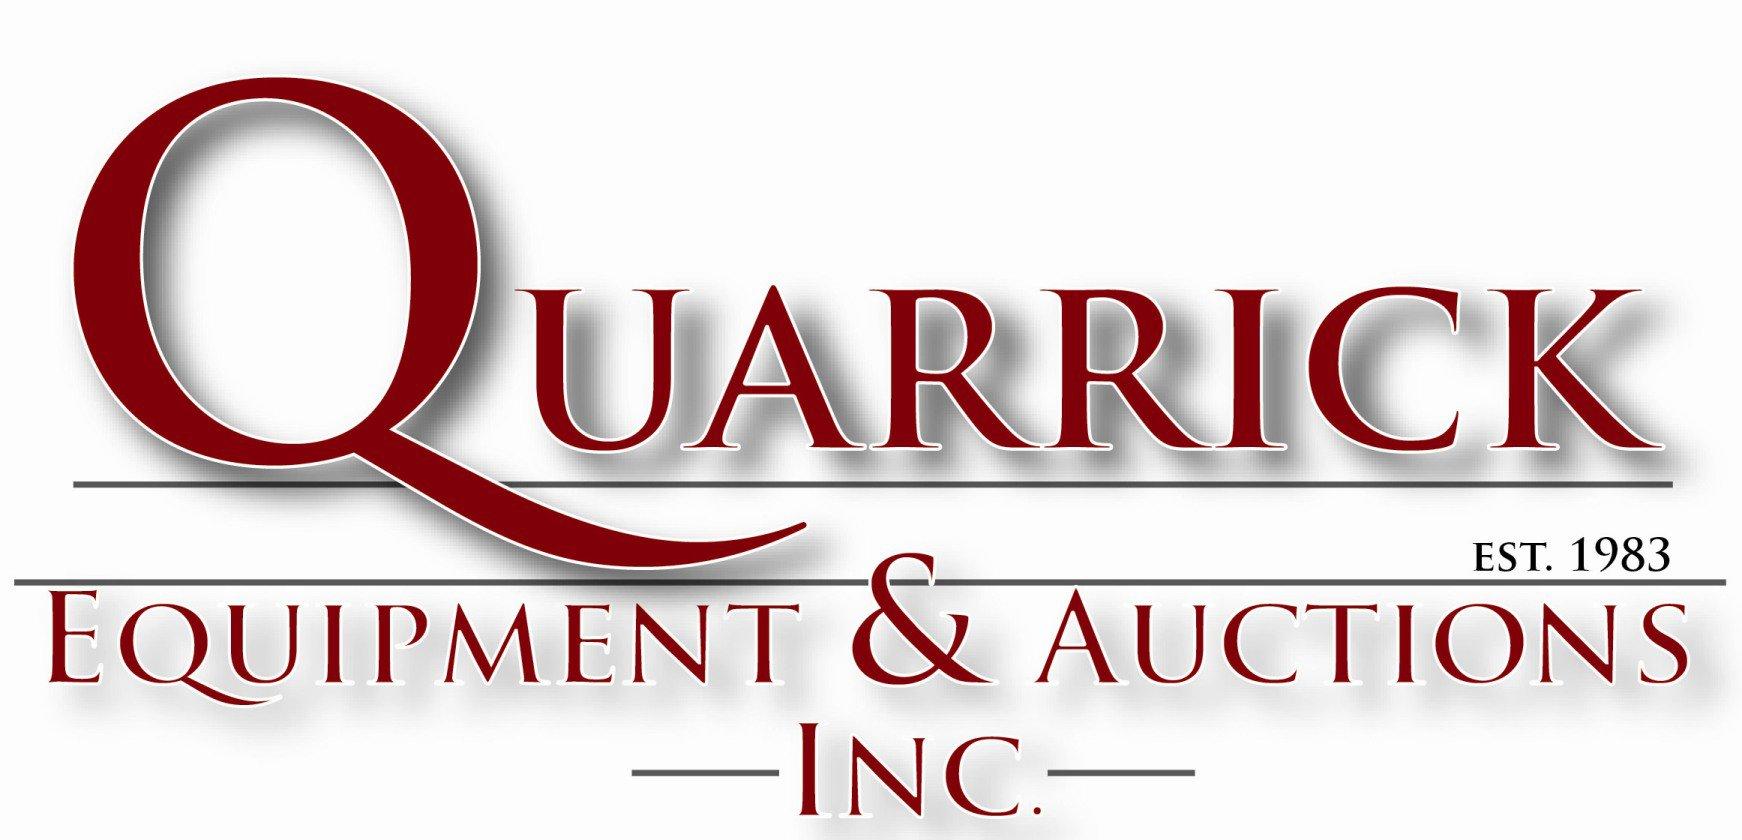 Quarrick Equipment & Auctions Inc